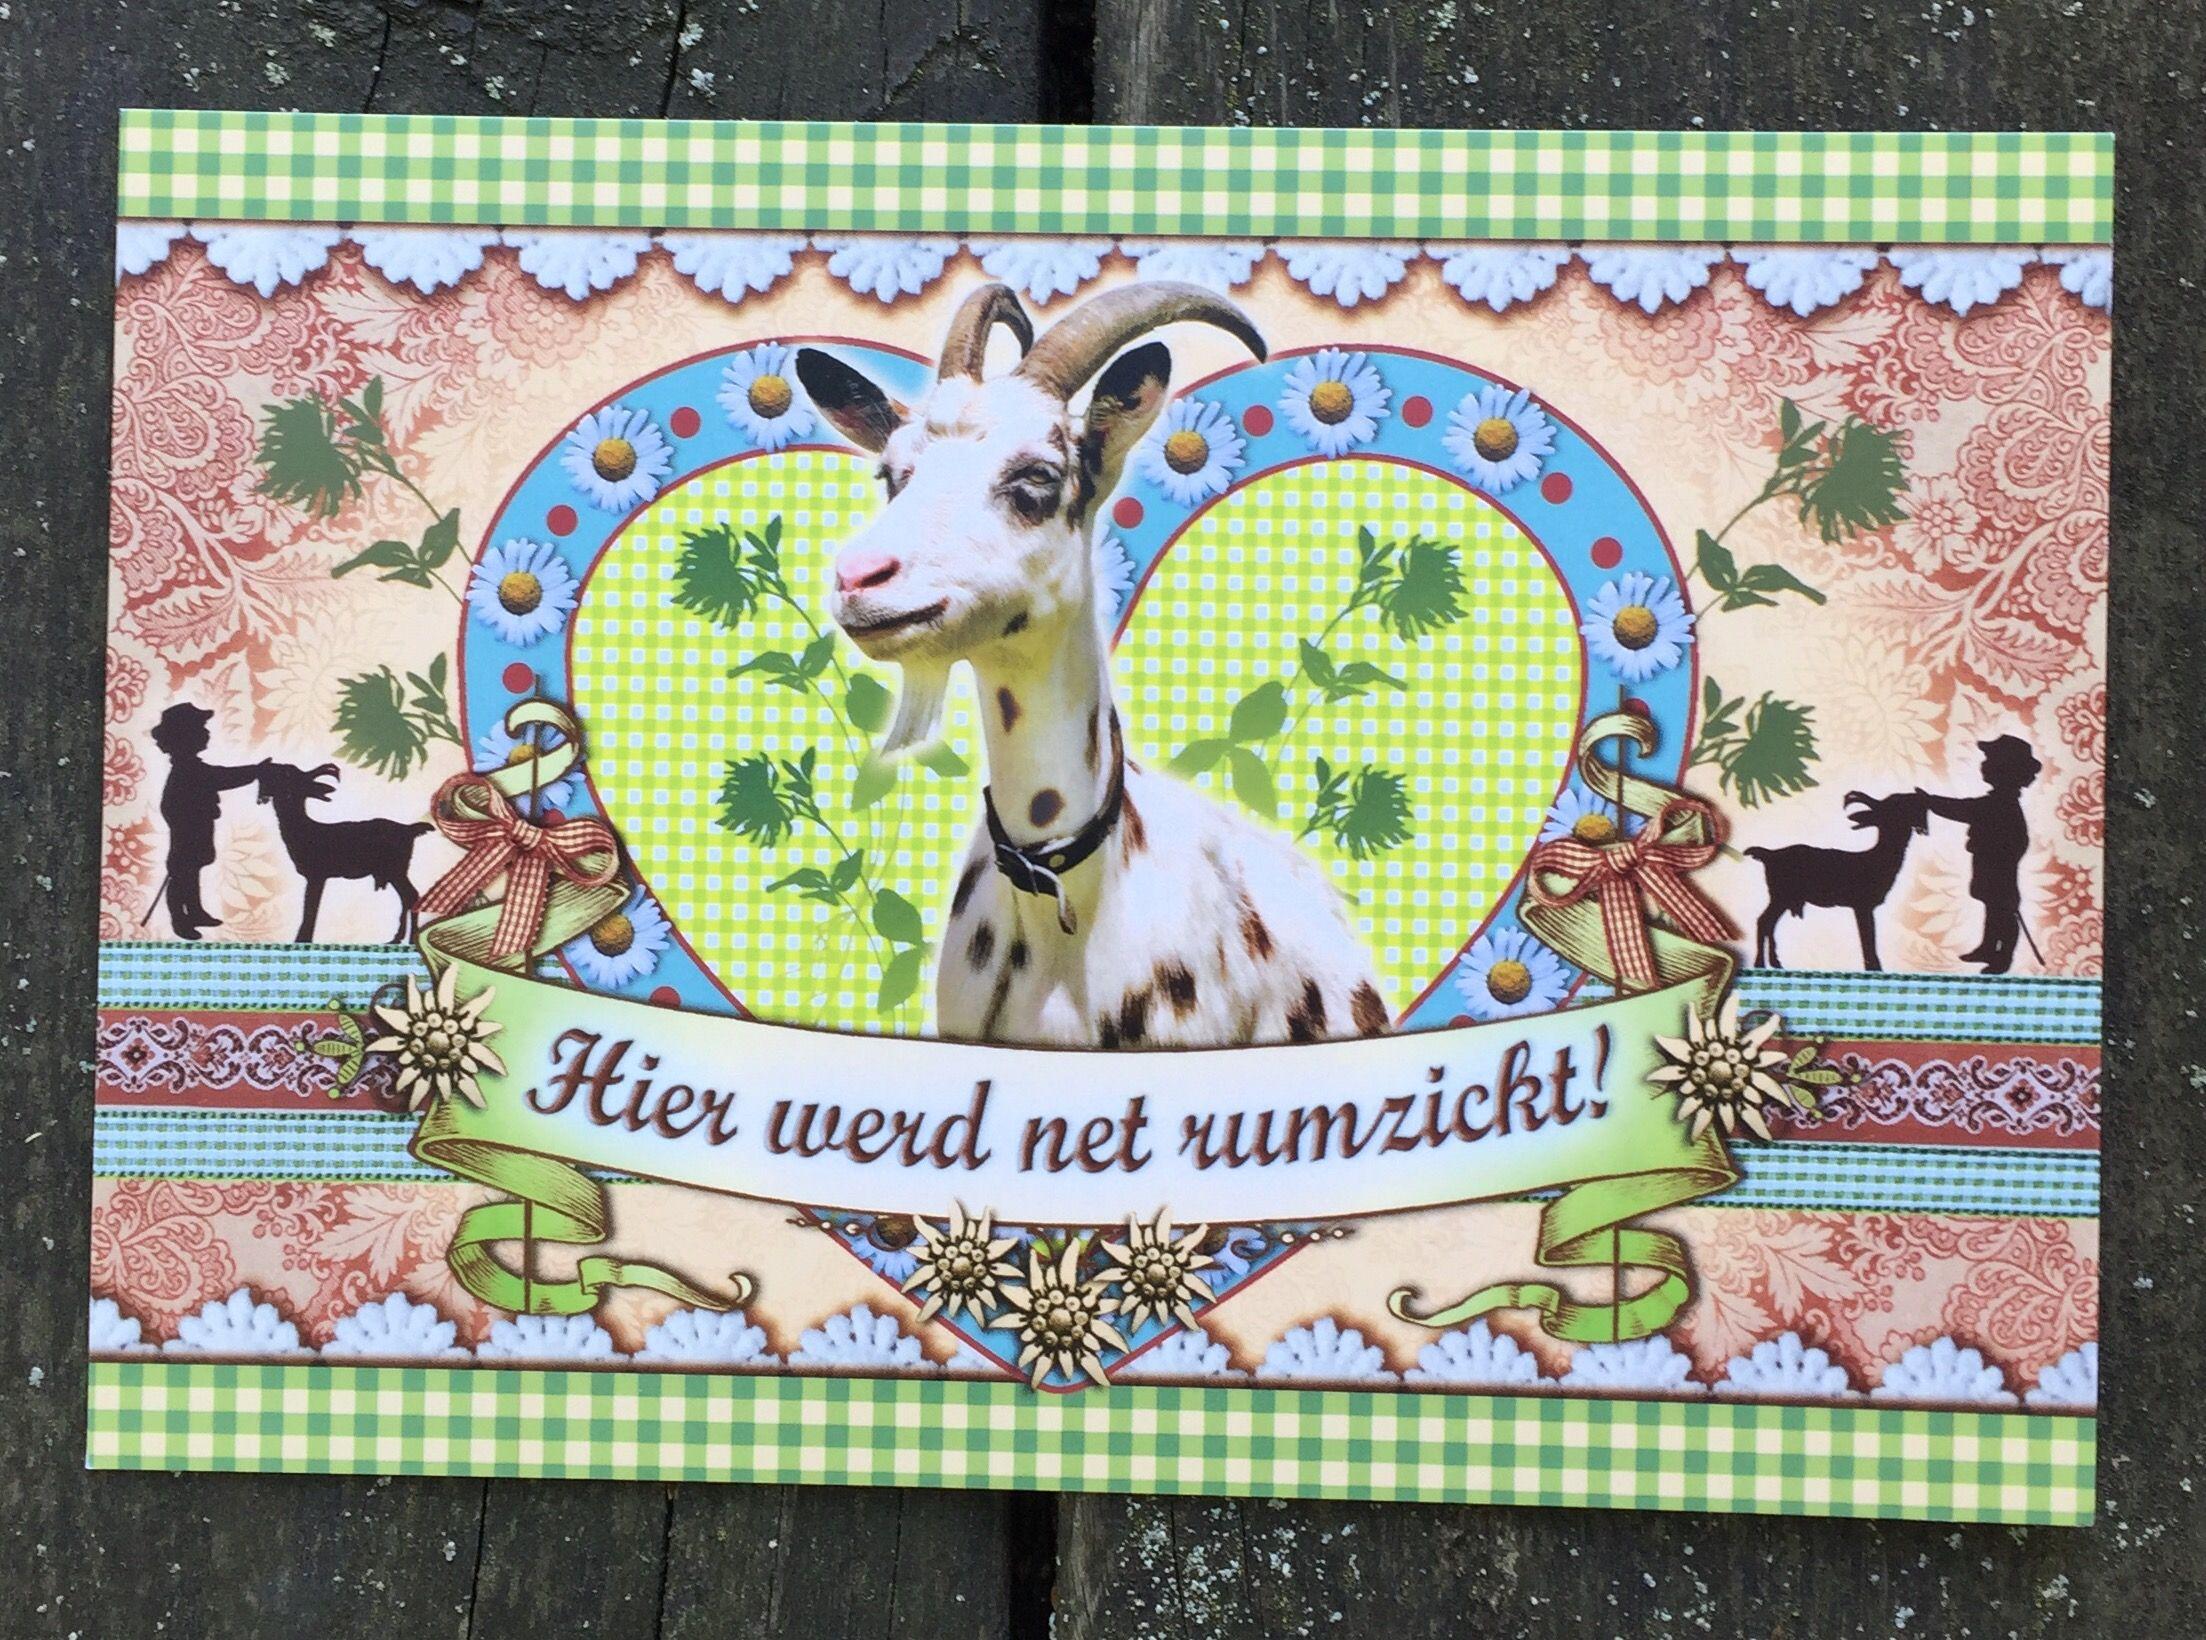 Postkarte mit Witz